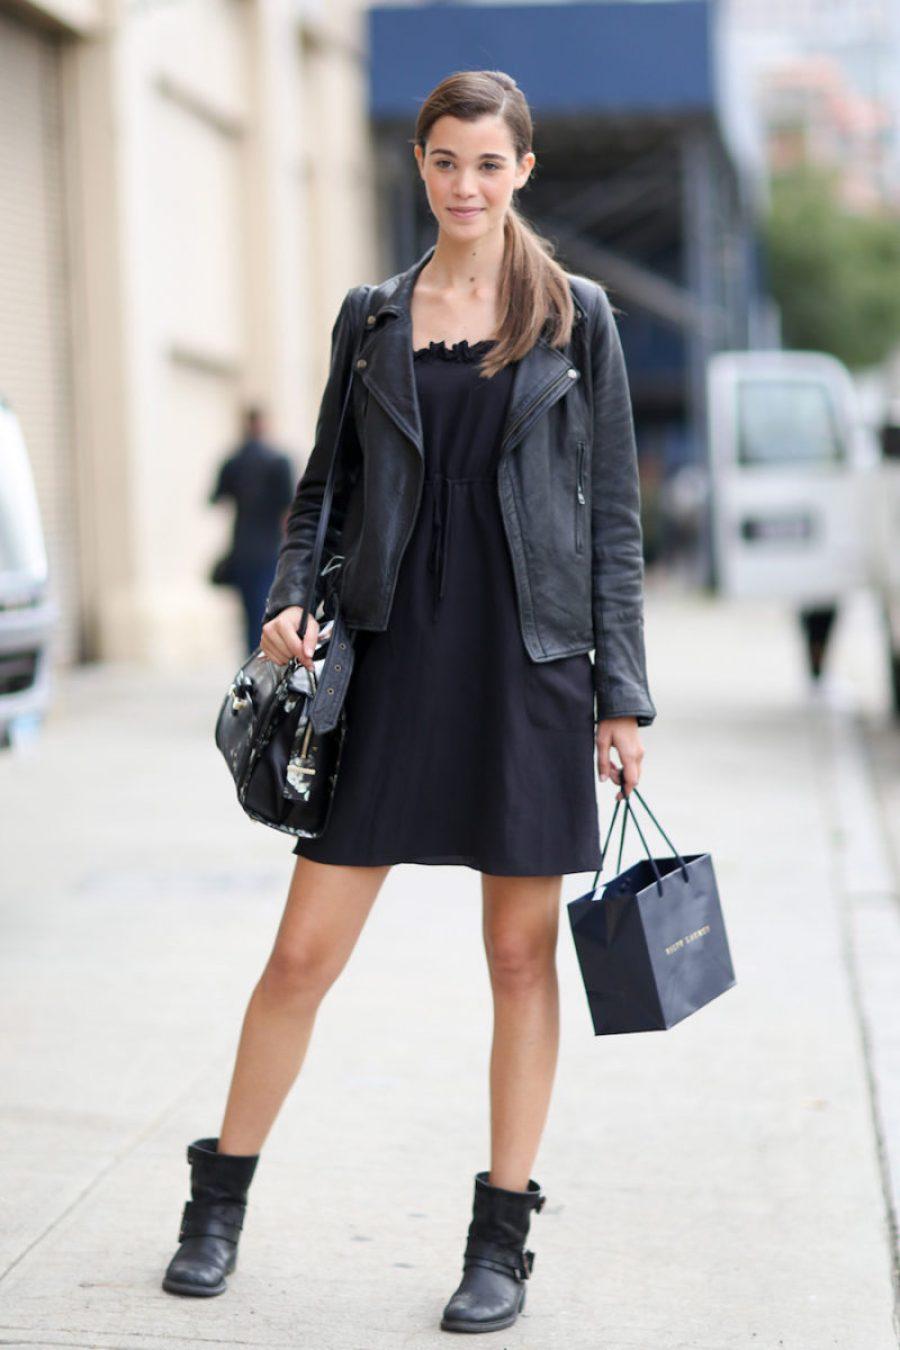 Image source: www.FashionGum.com